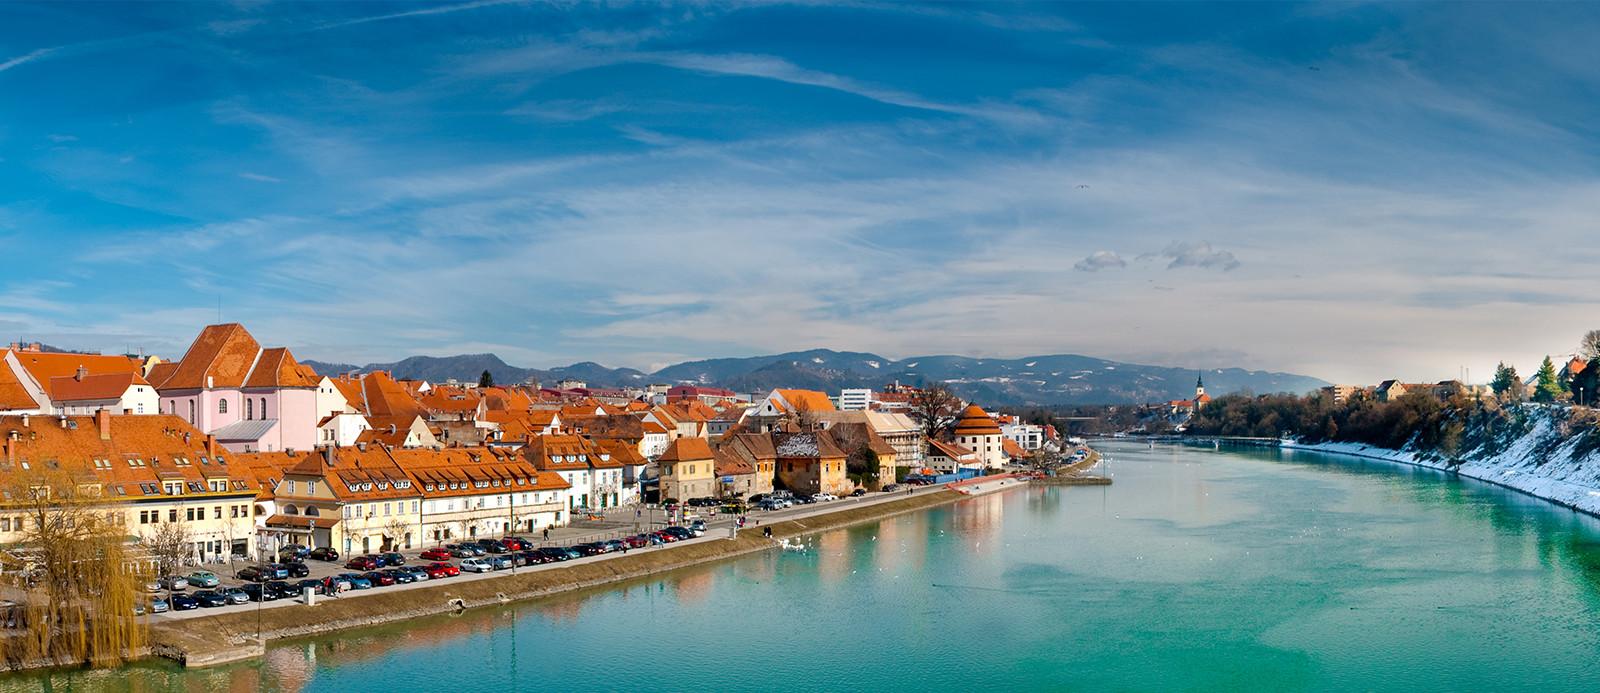 Experience in Maribor, Slovenia by Pia | Erasmus experience Maribor